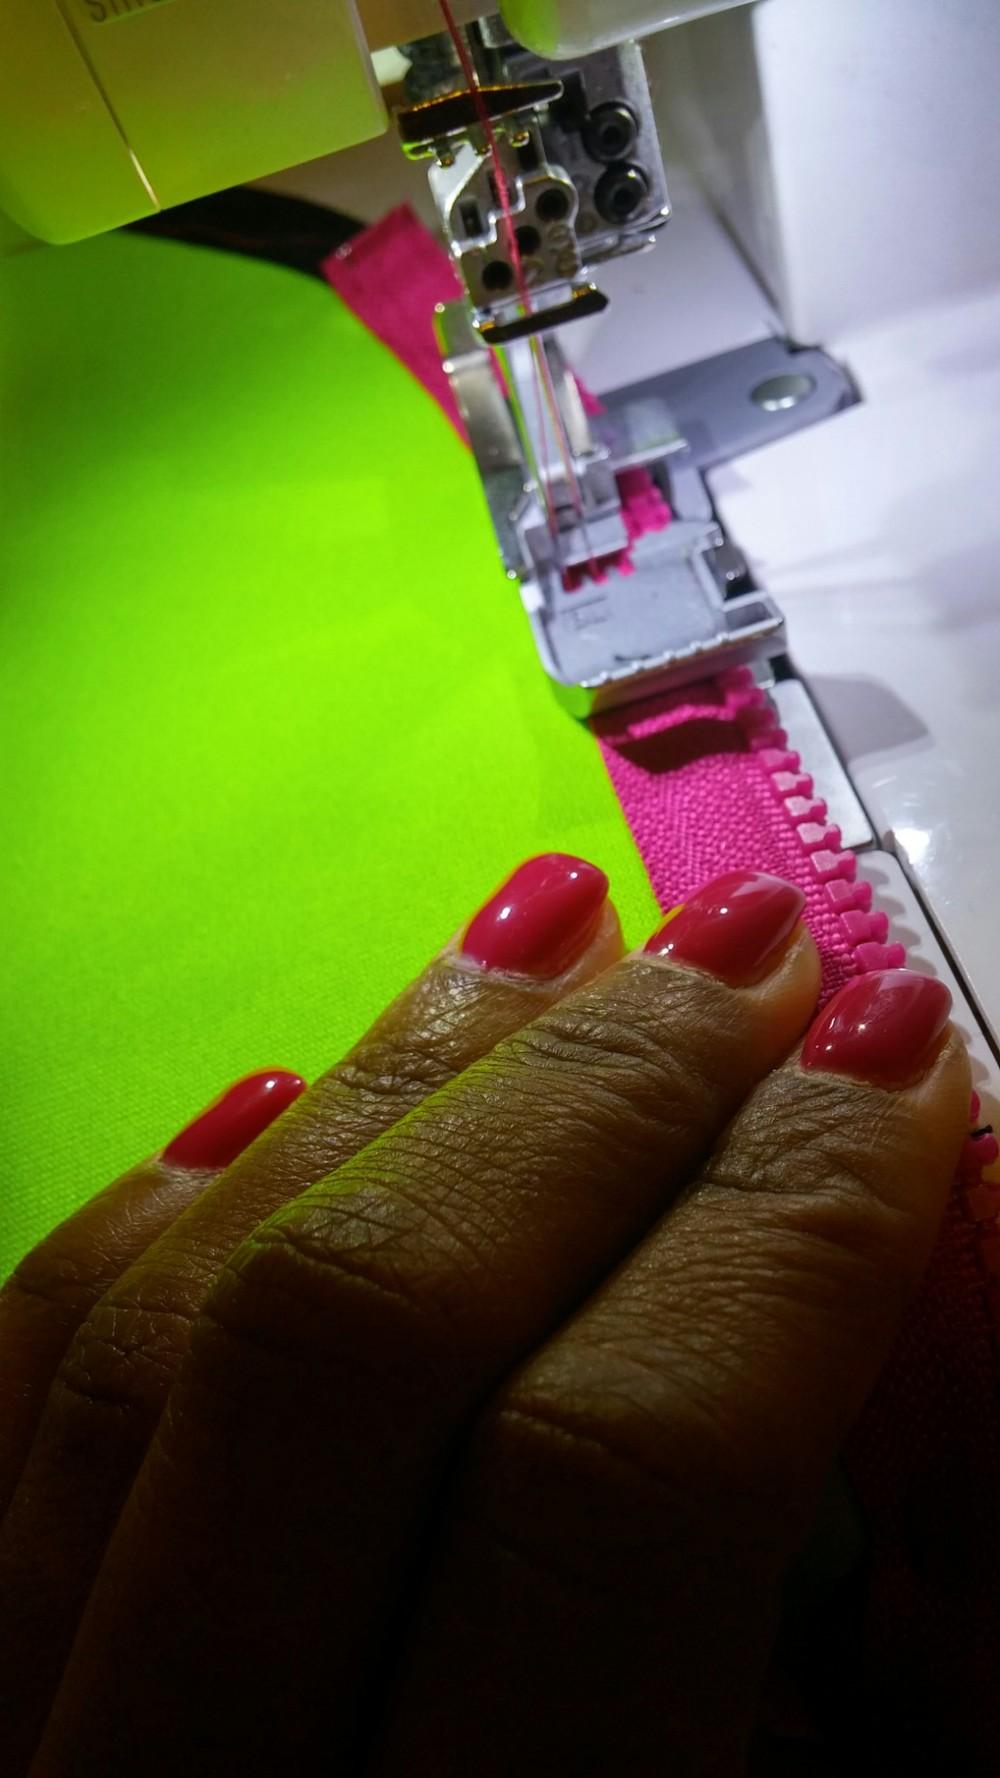 Sewing pink zipper on neoprene dress. 3degreesdb.com